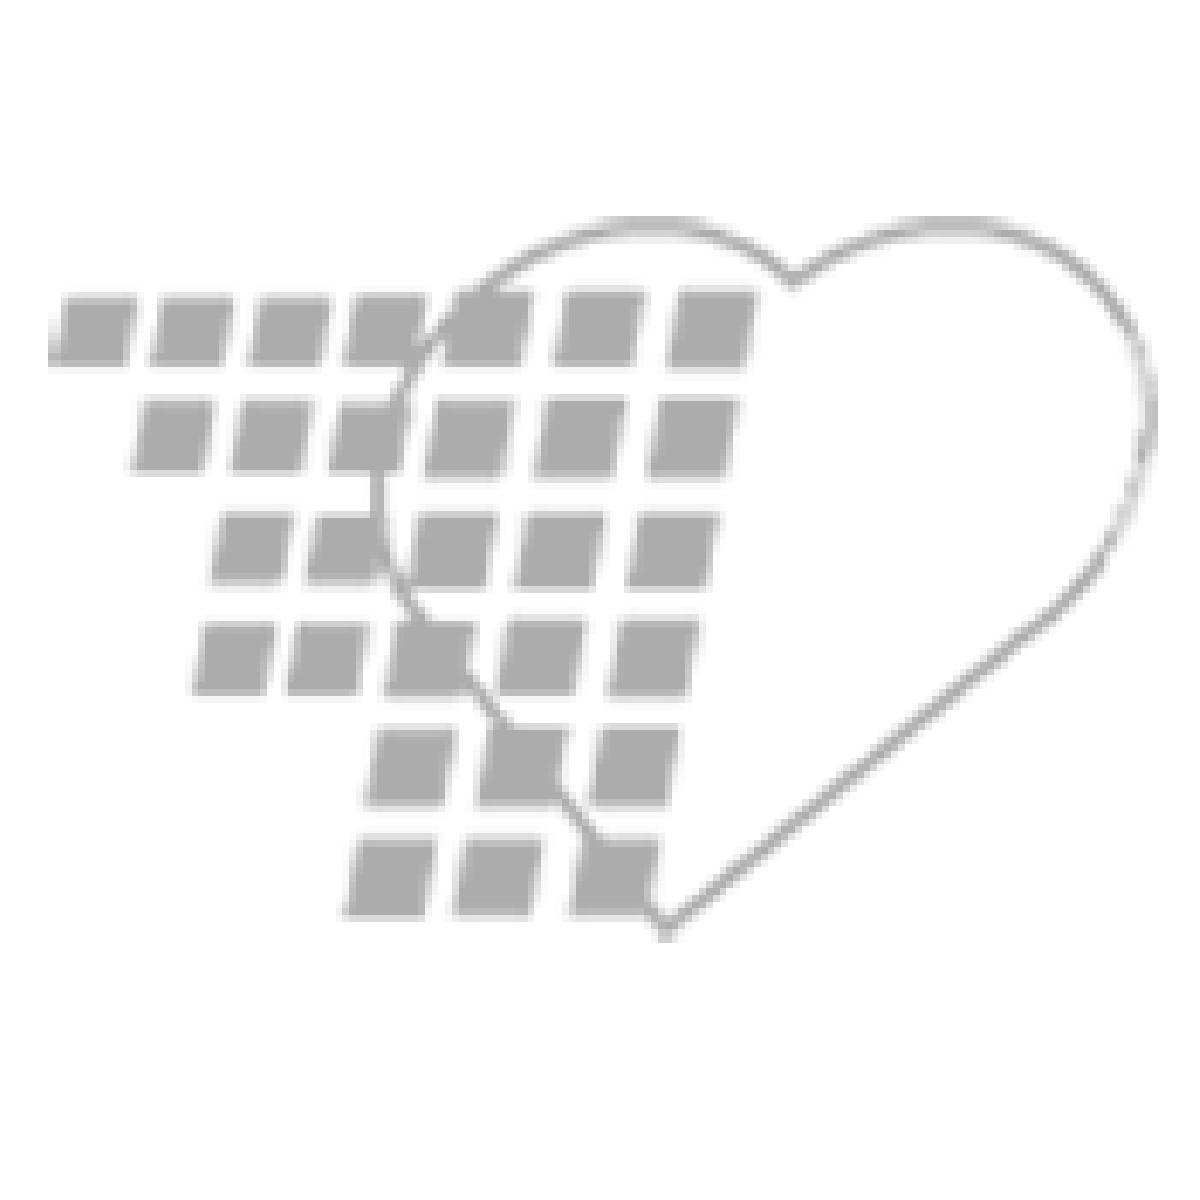 05-26-1900 Catheter Care Kit-PVP Swabsticks